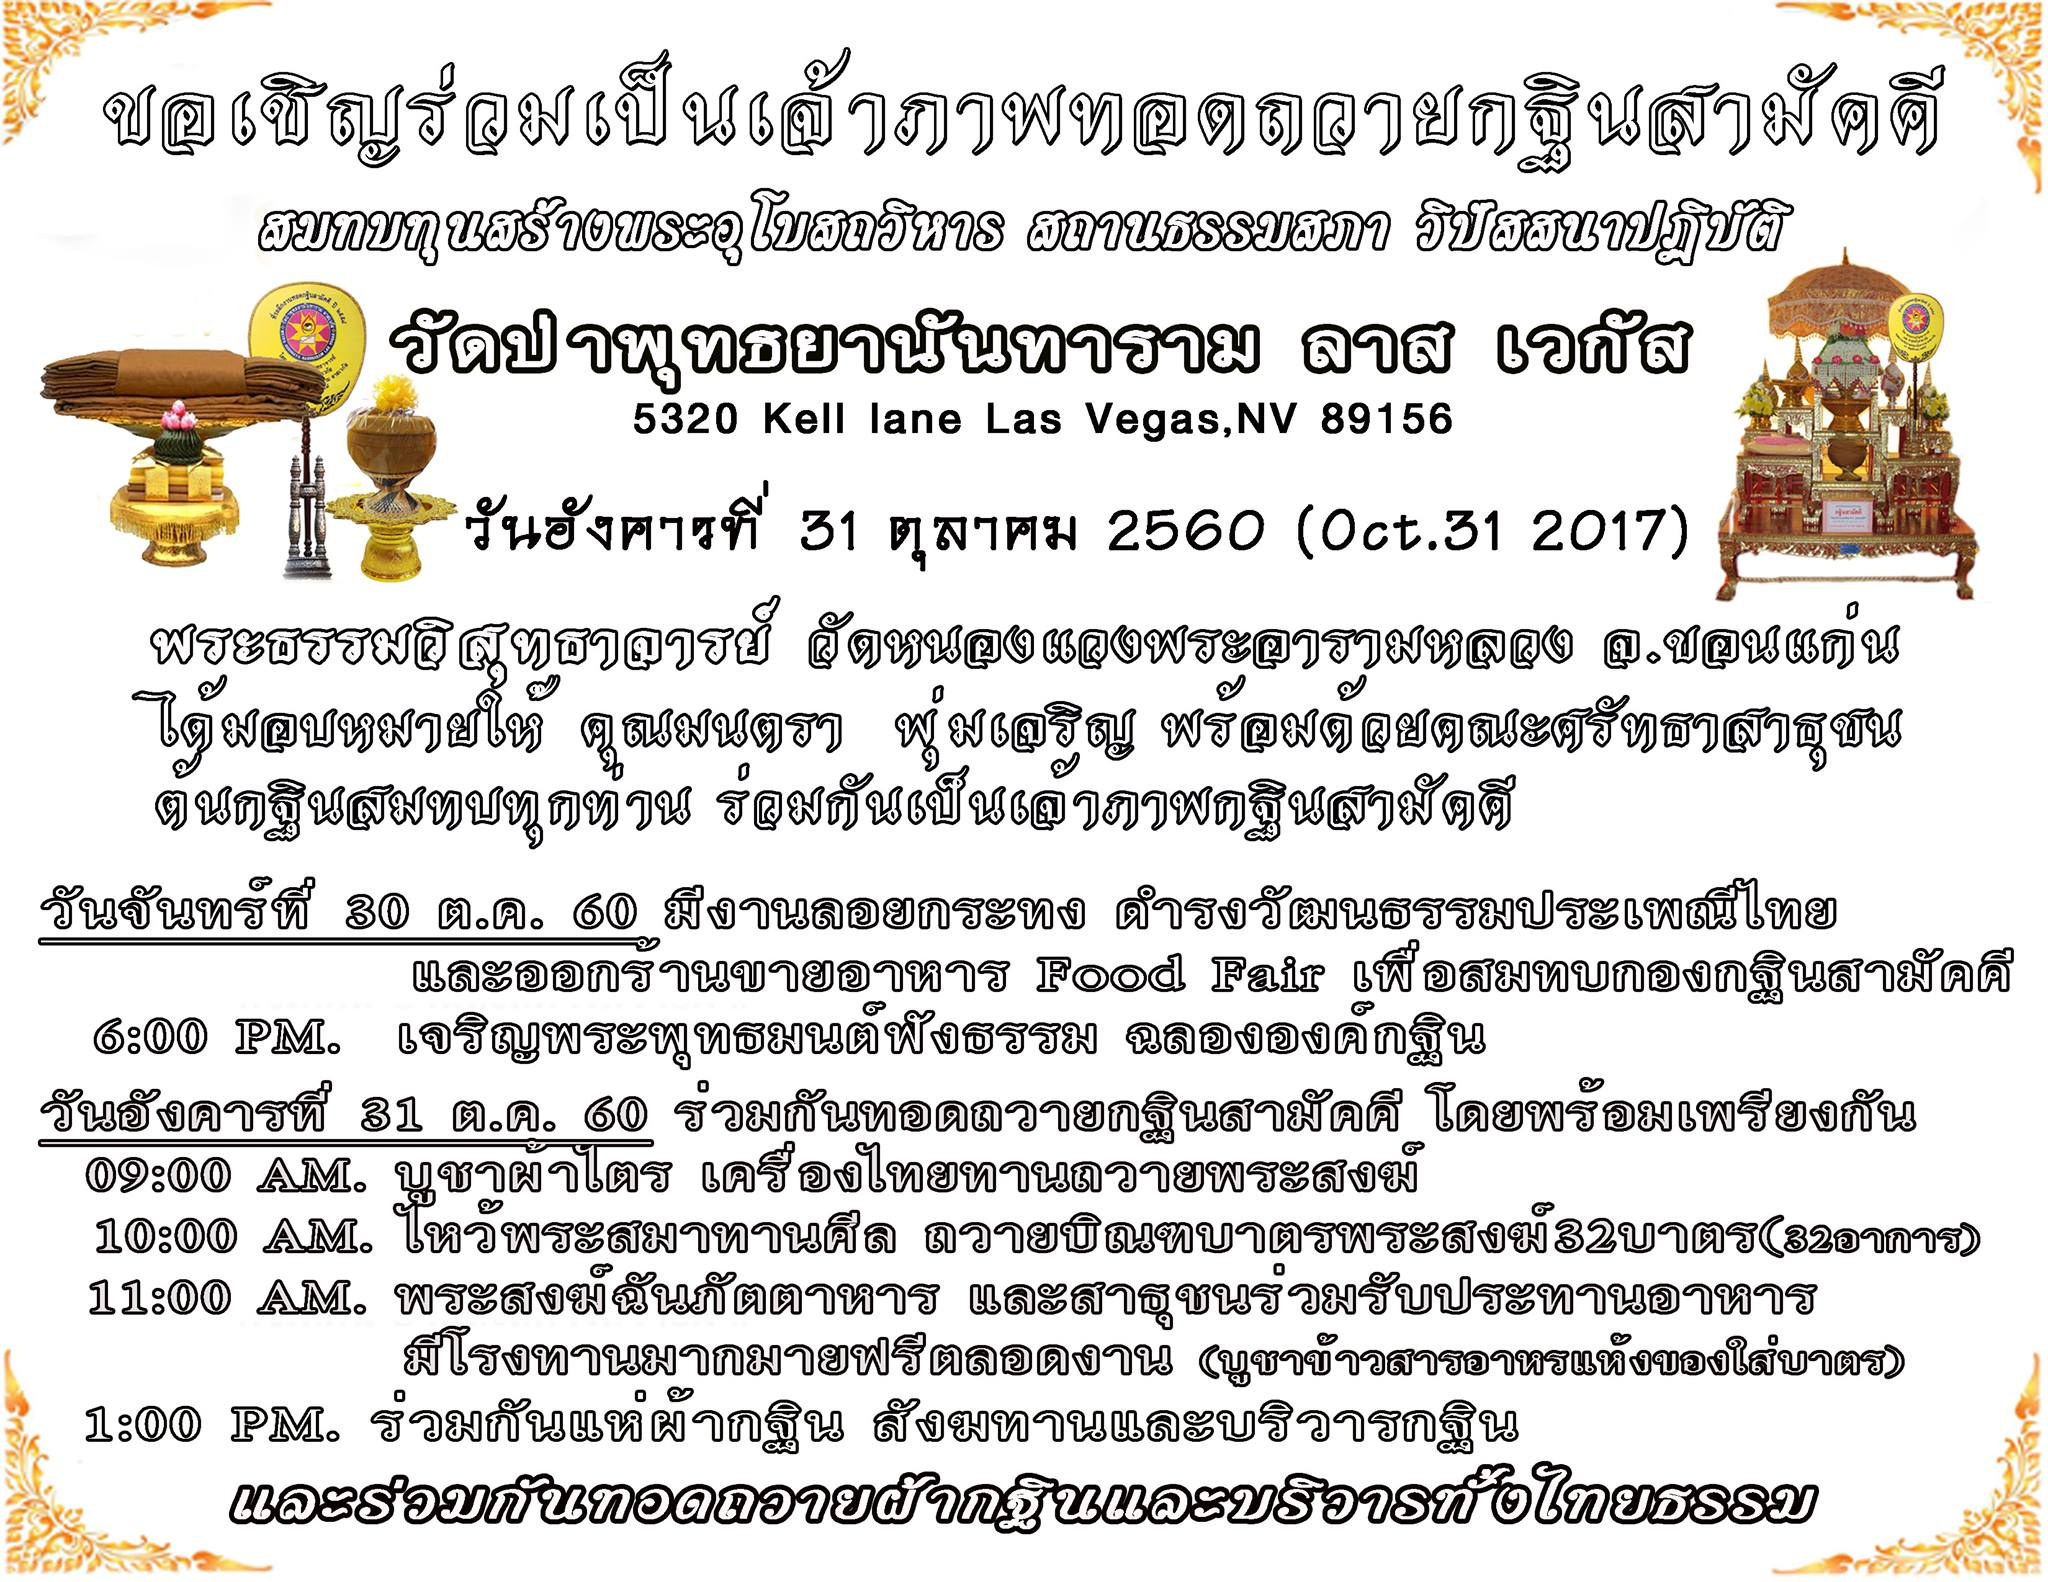 Watpa Buddhaya Nandharam Food Fair Oct 31 2017